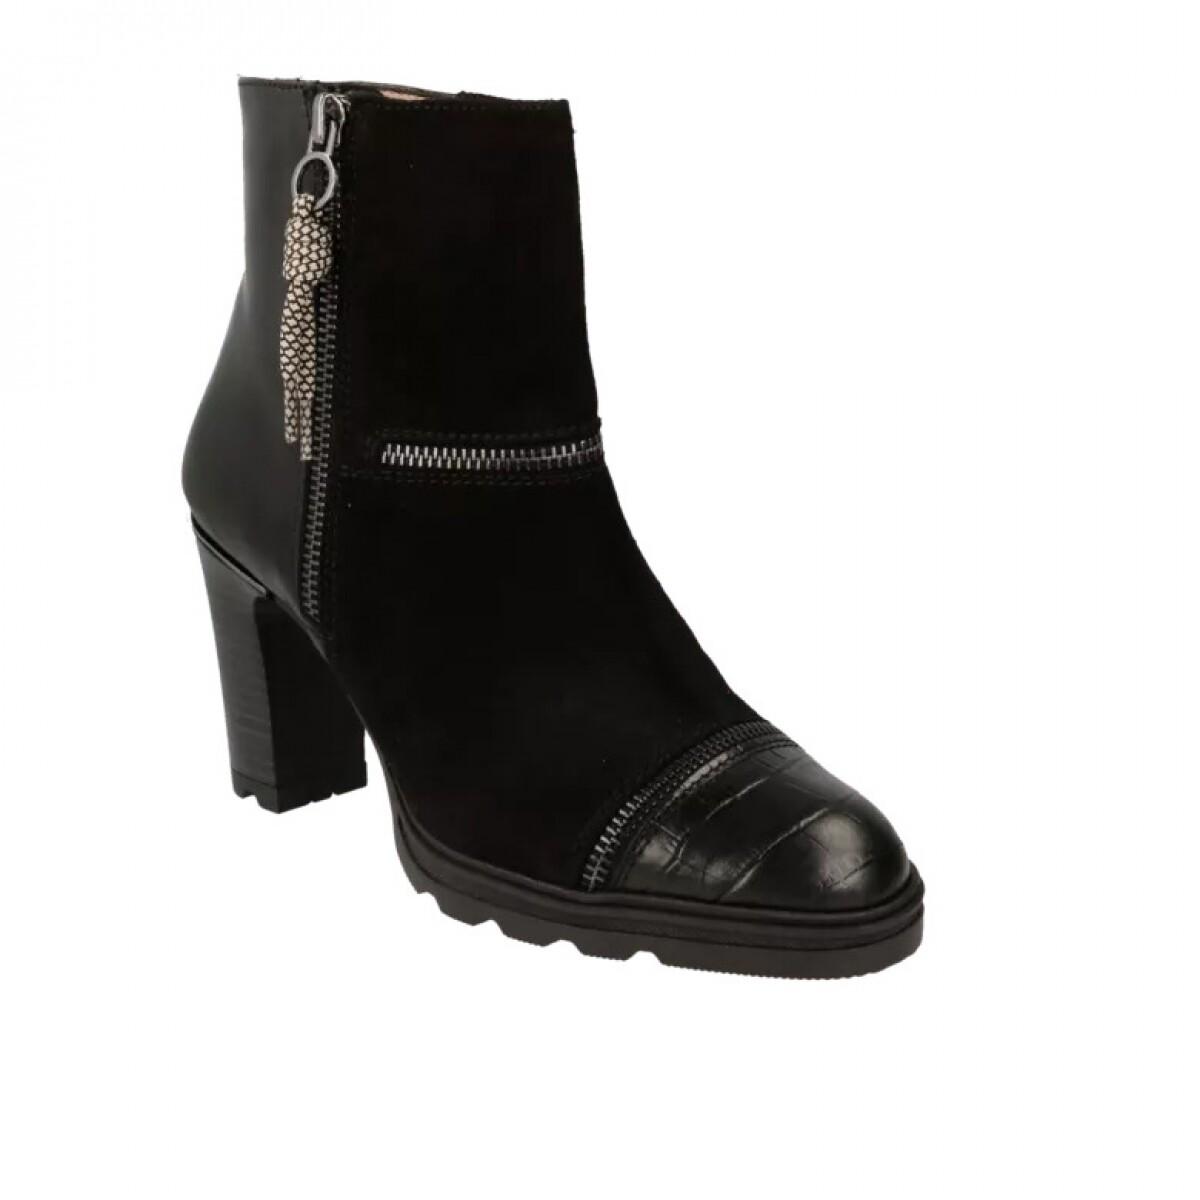 Hispanitas Ankle boot black